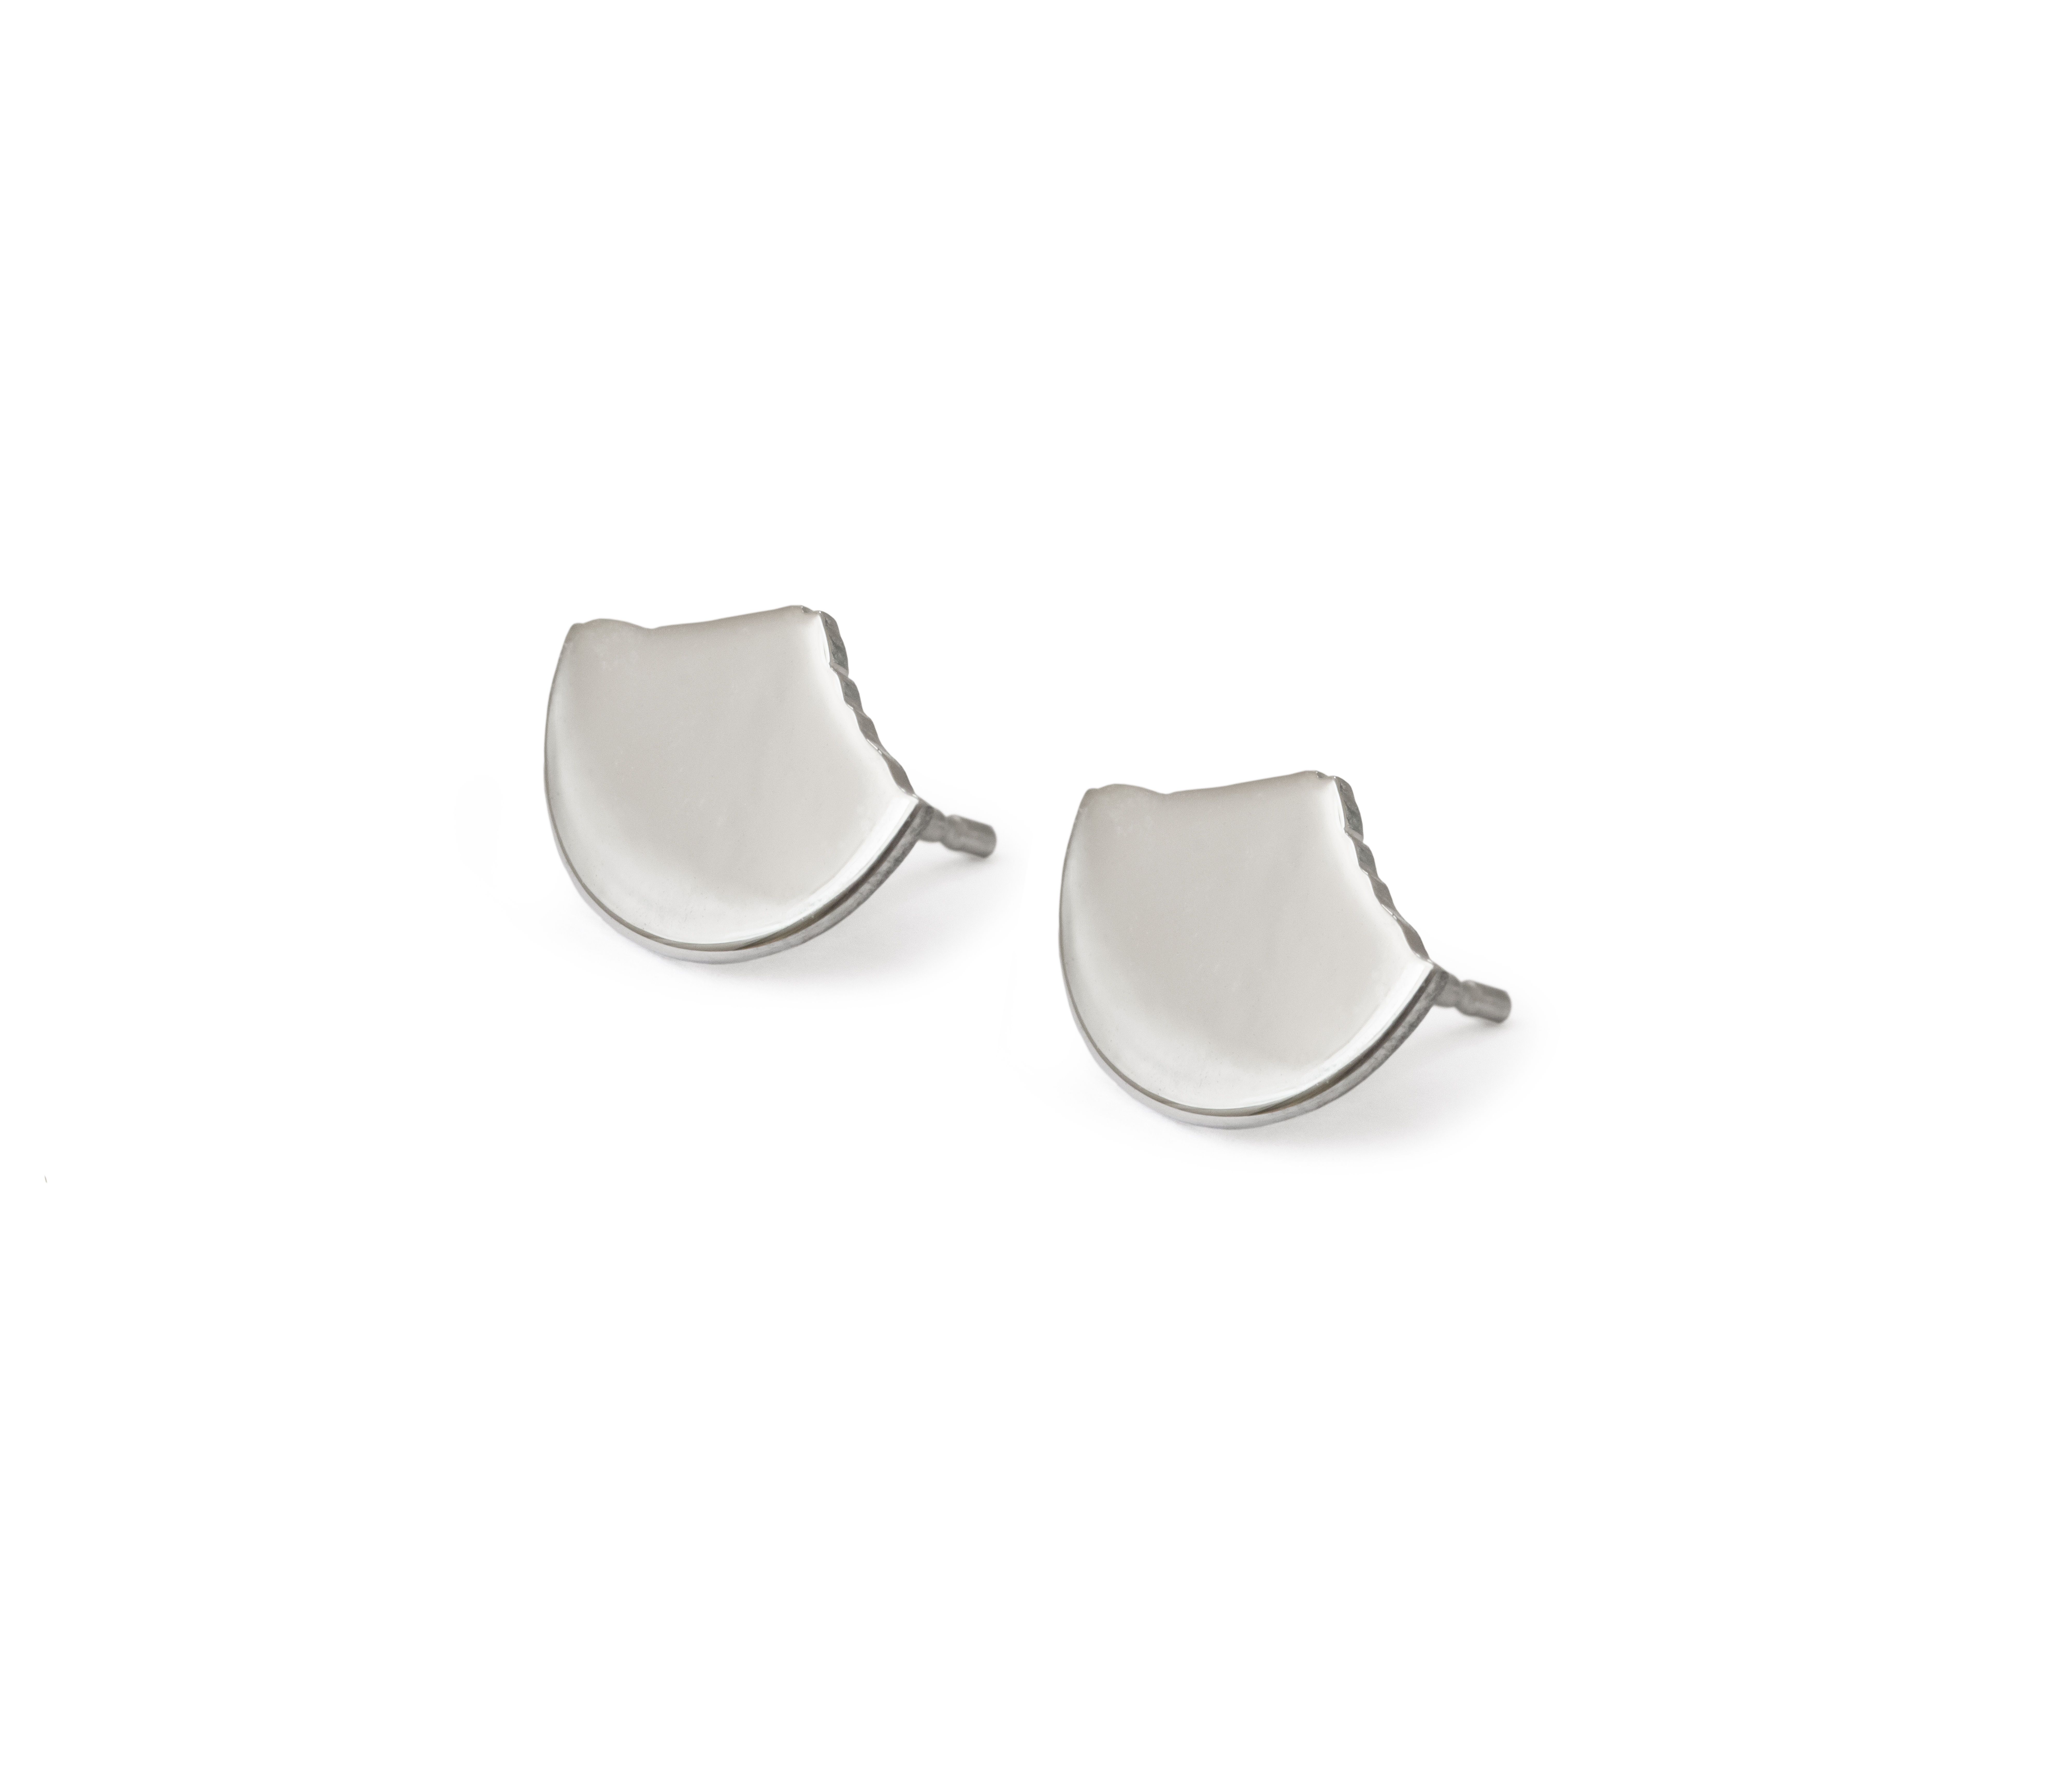 Schiehallion Earrings Small